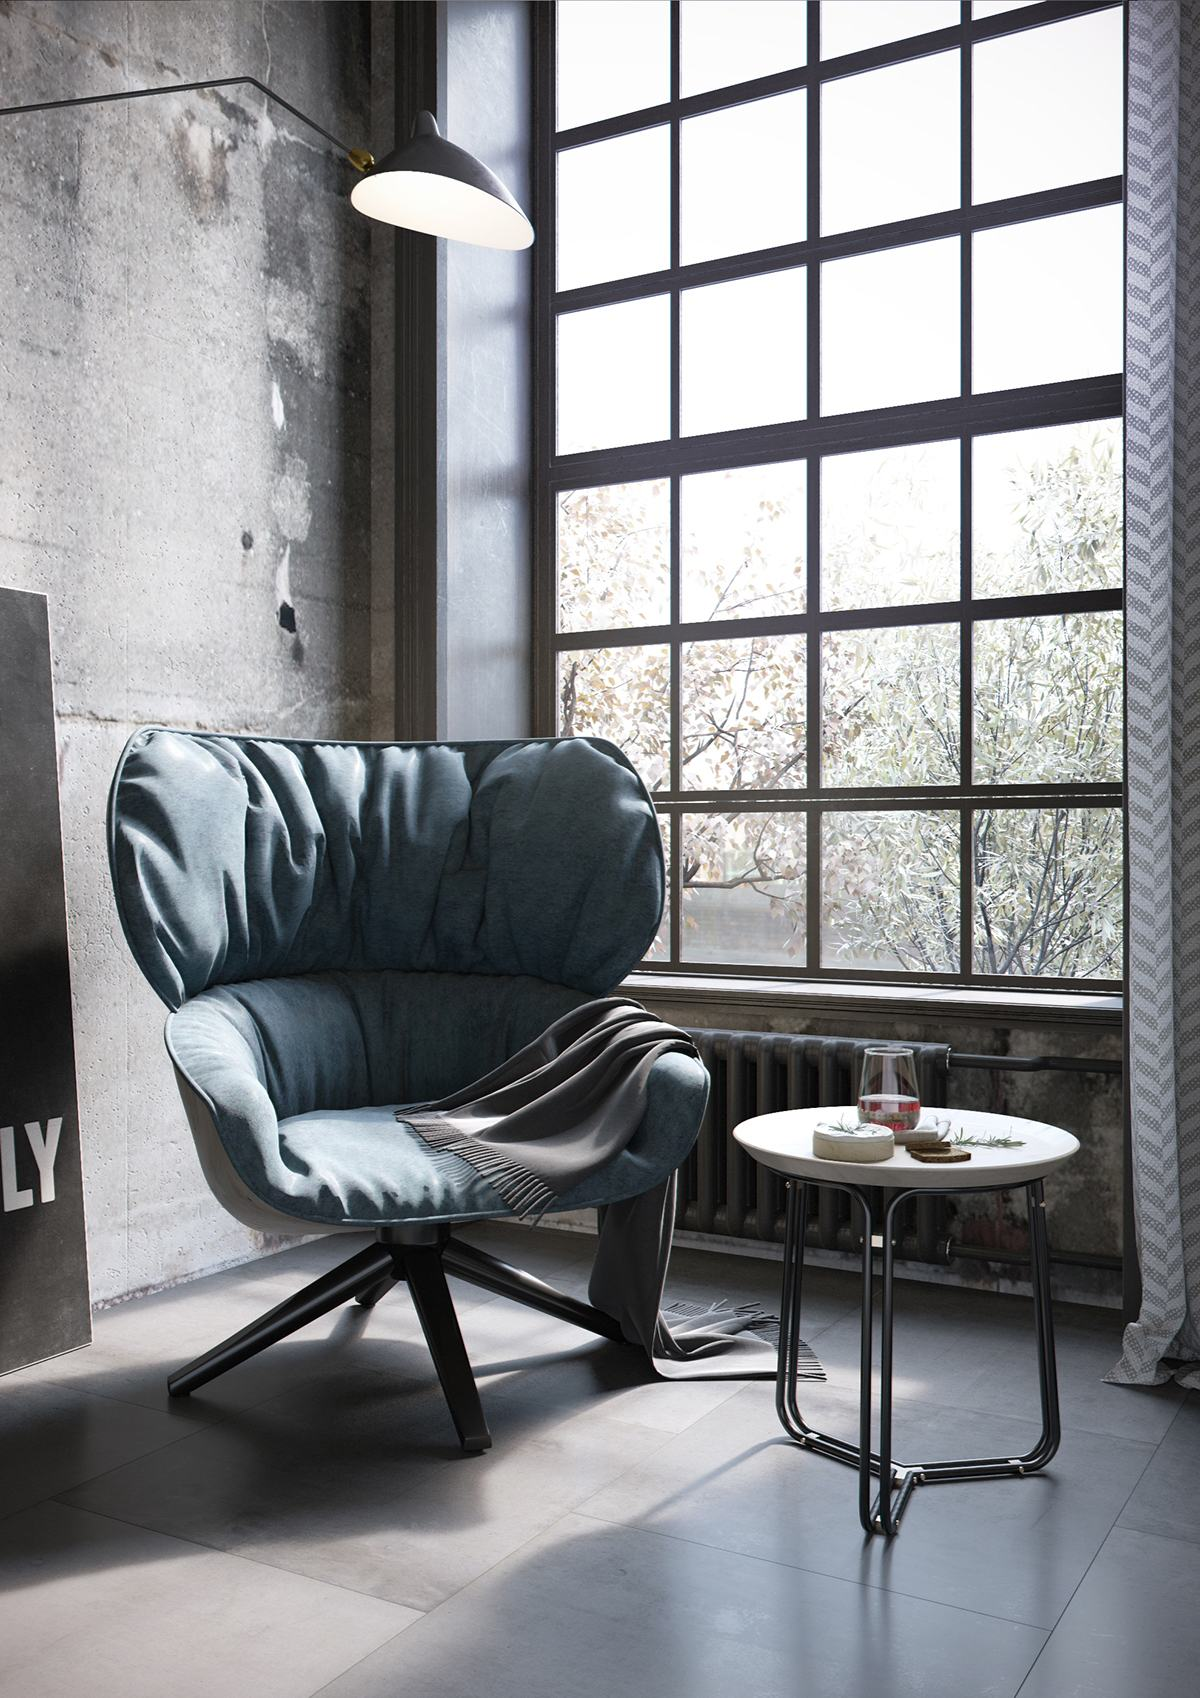 Dining Room Chandelier Brightens Up Industrial Loft 2